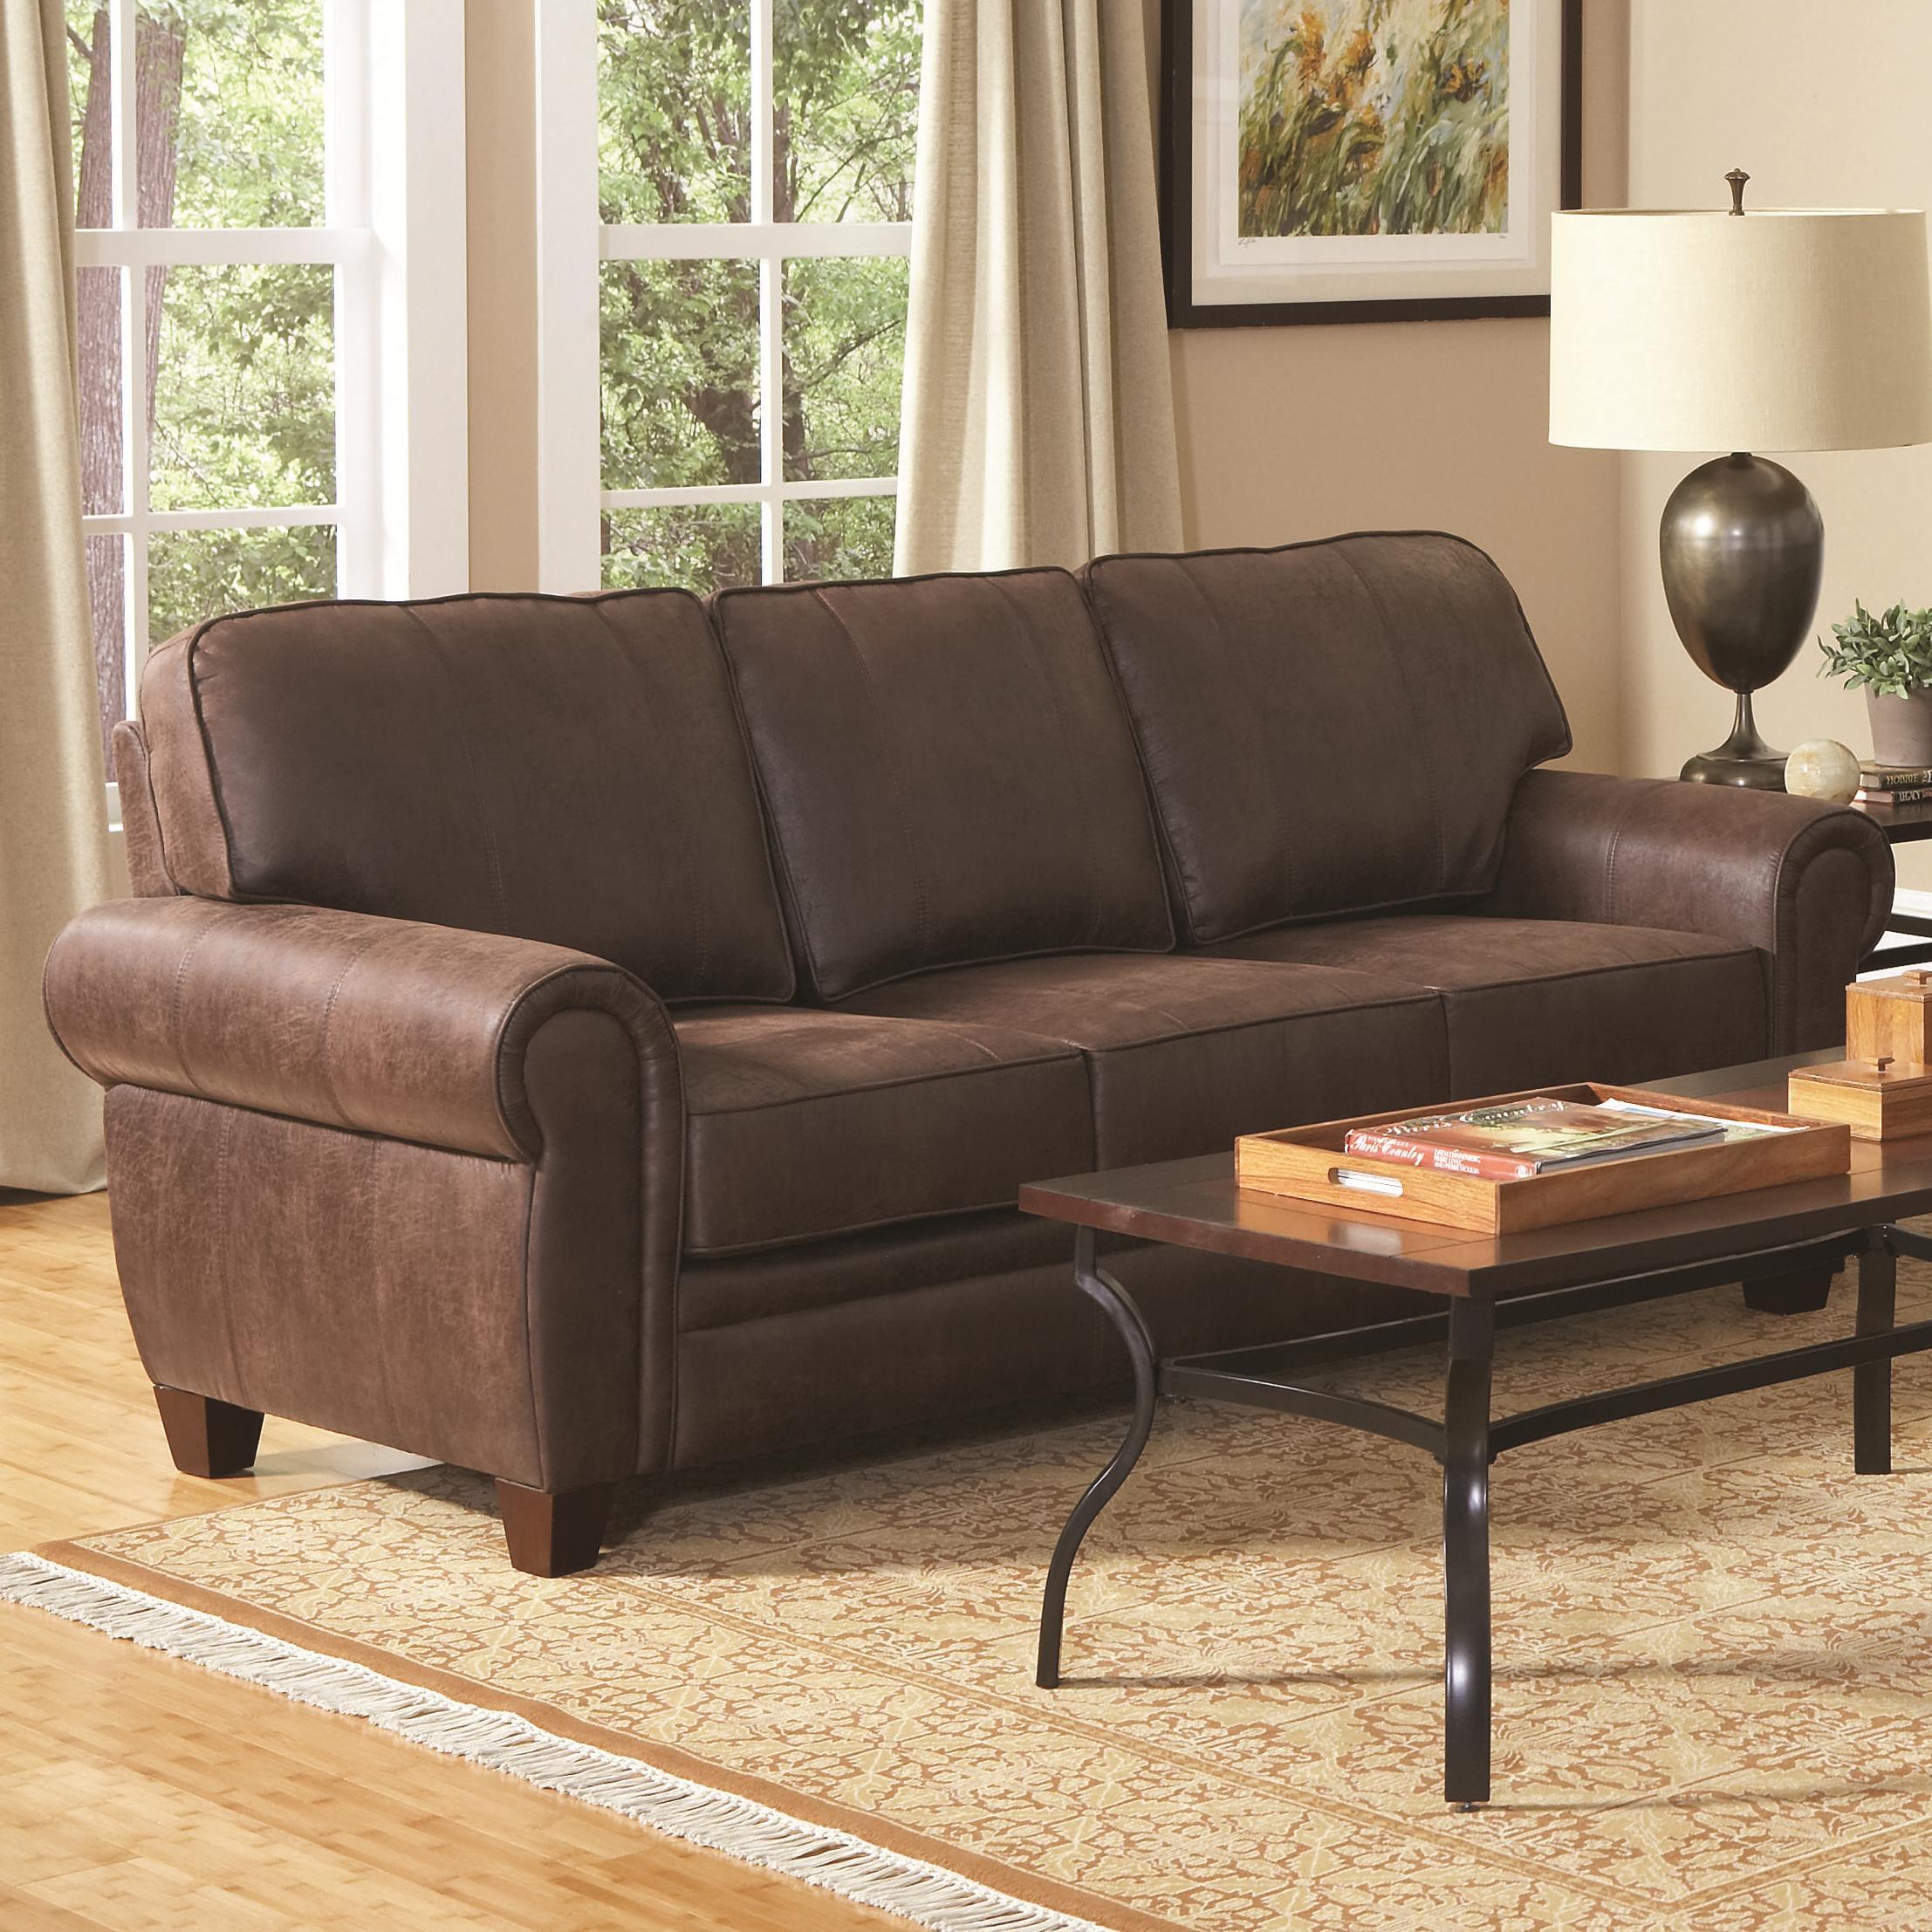 Coaster Bentley Sofa - Item Number: 504201